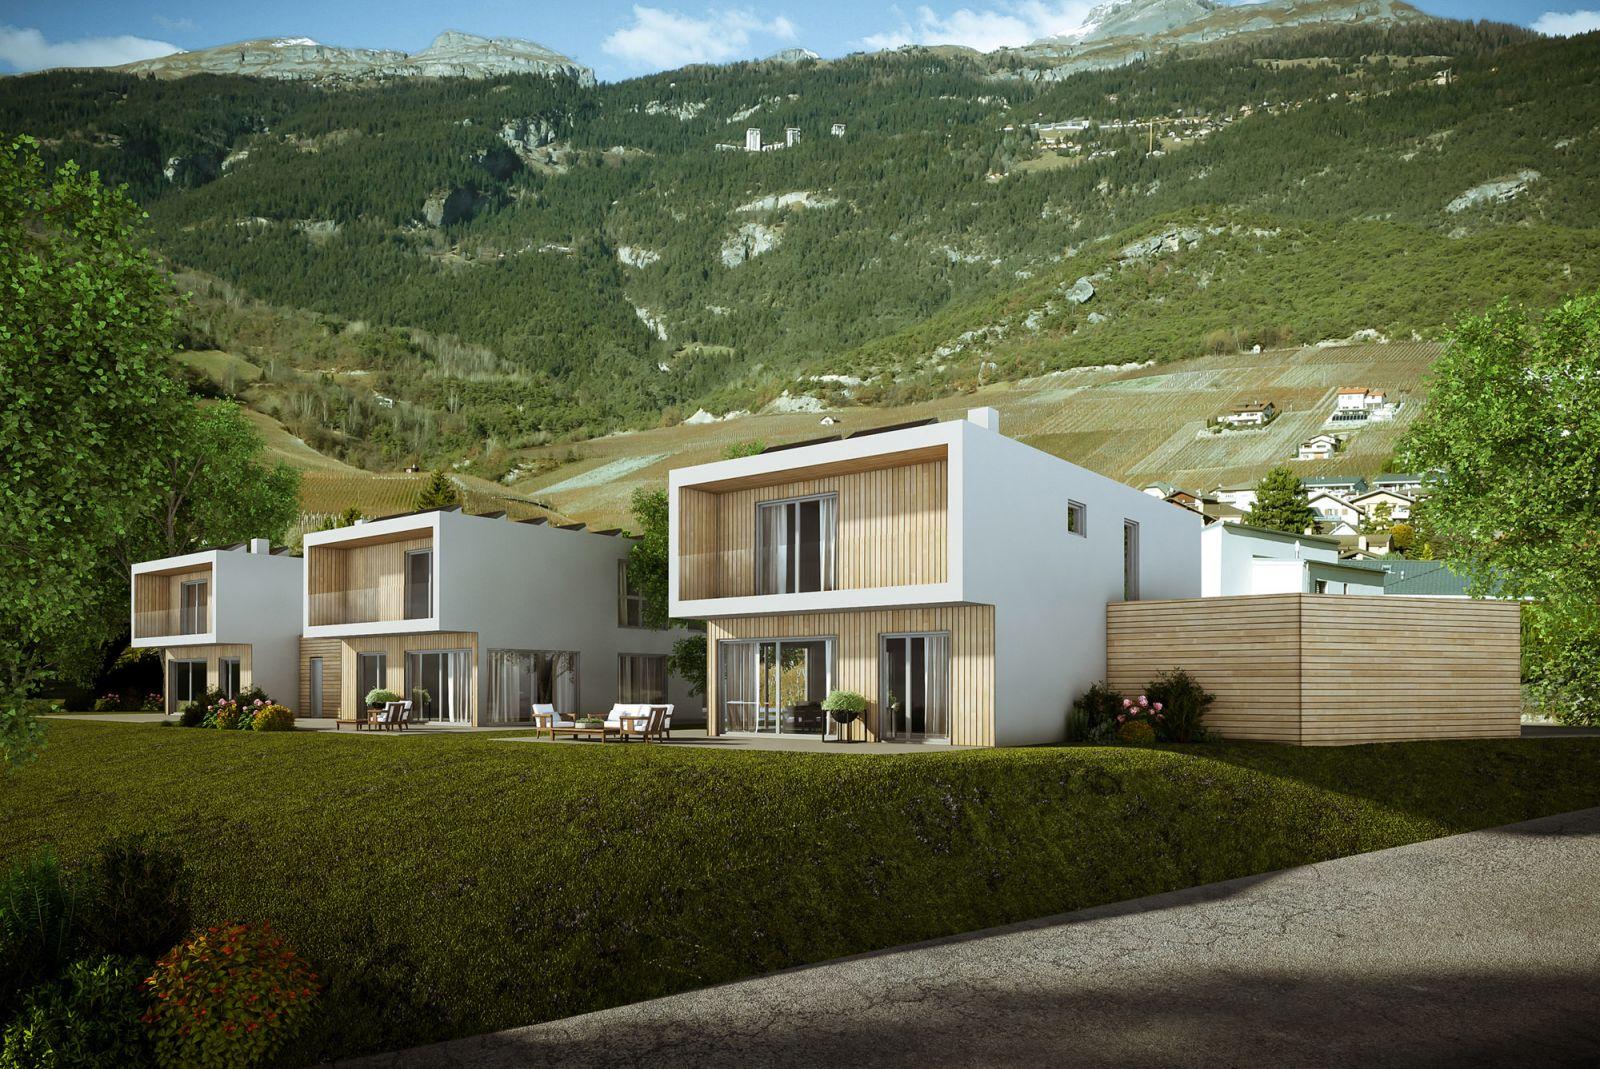 Miege Housing 486